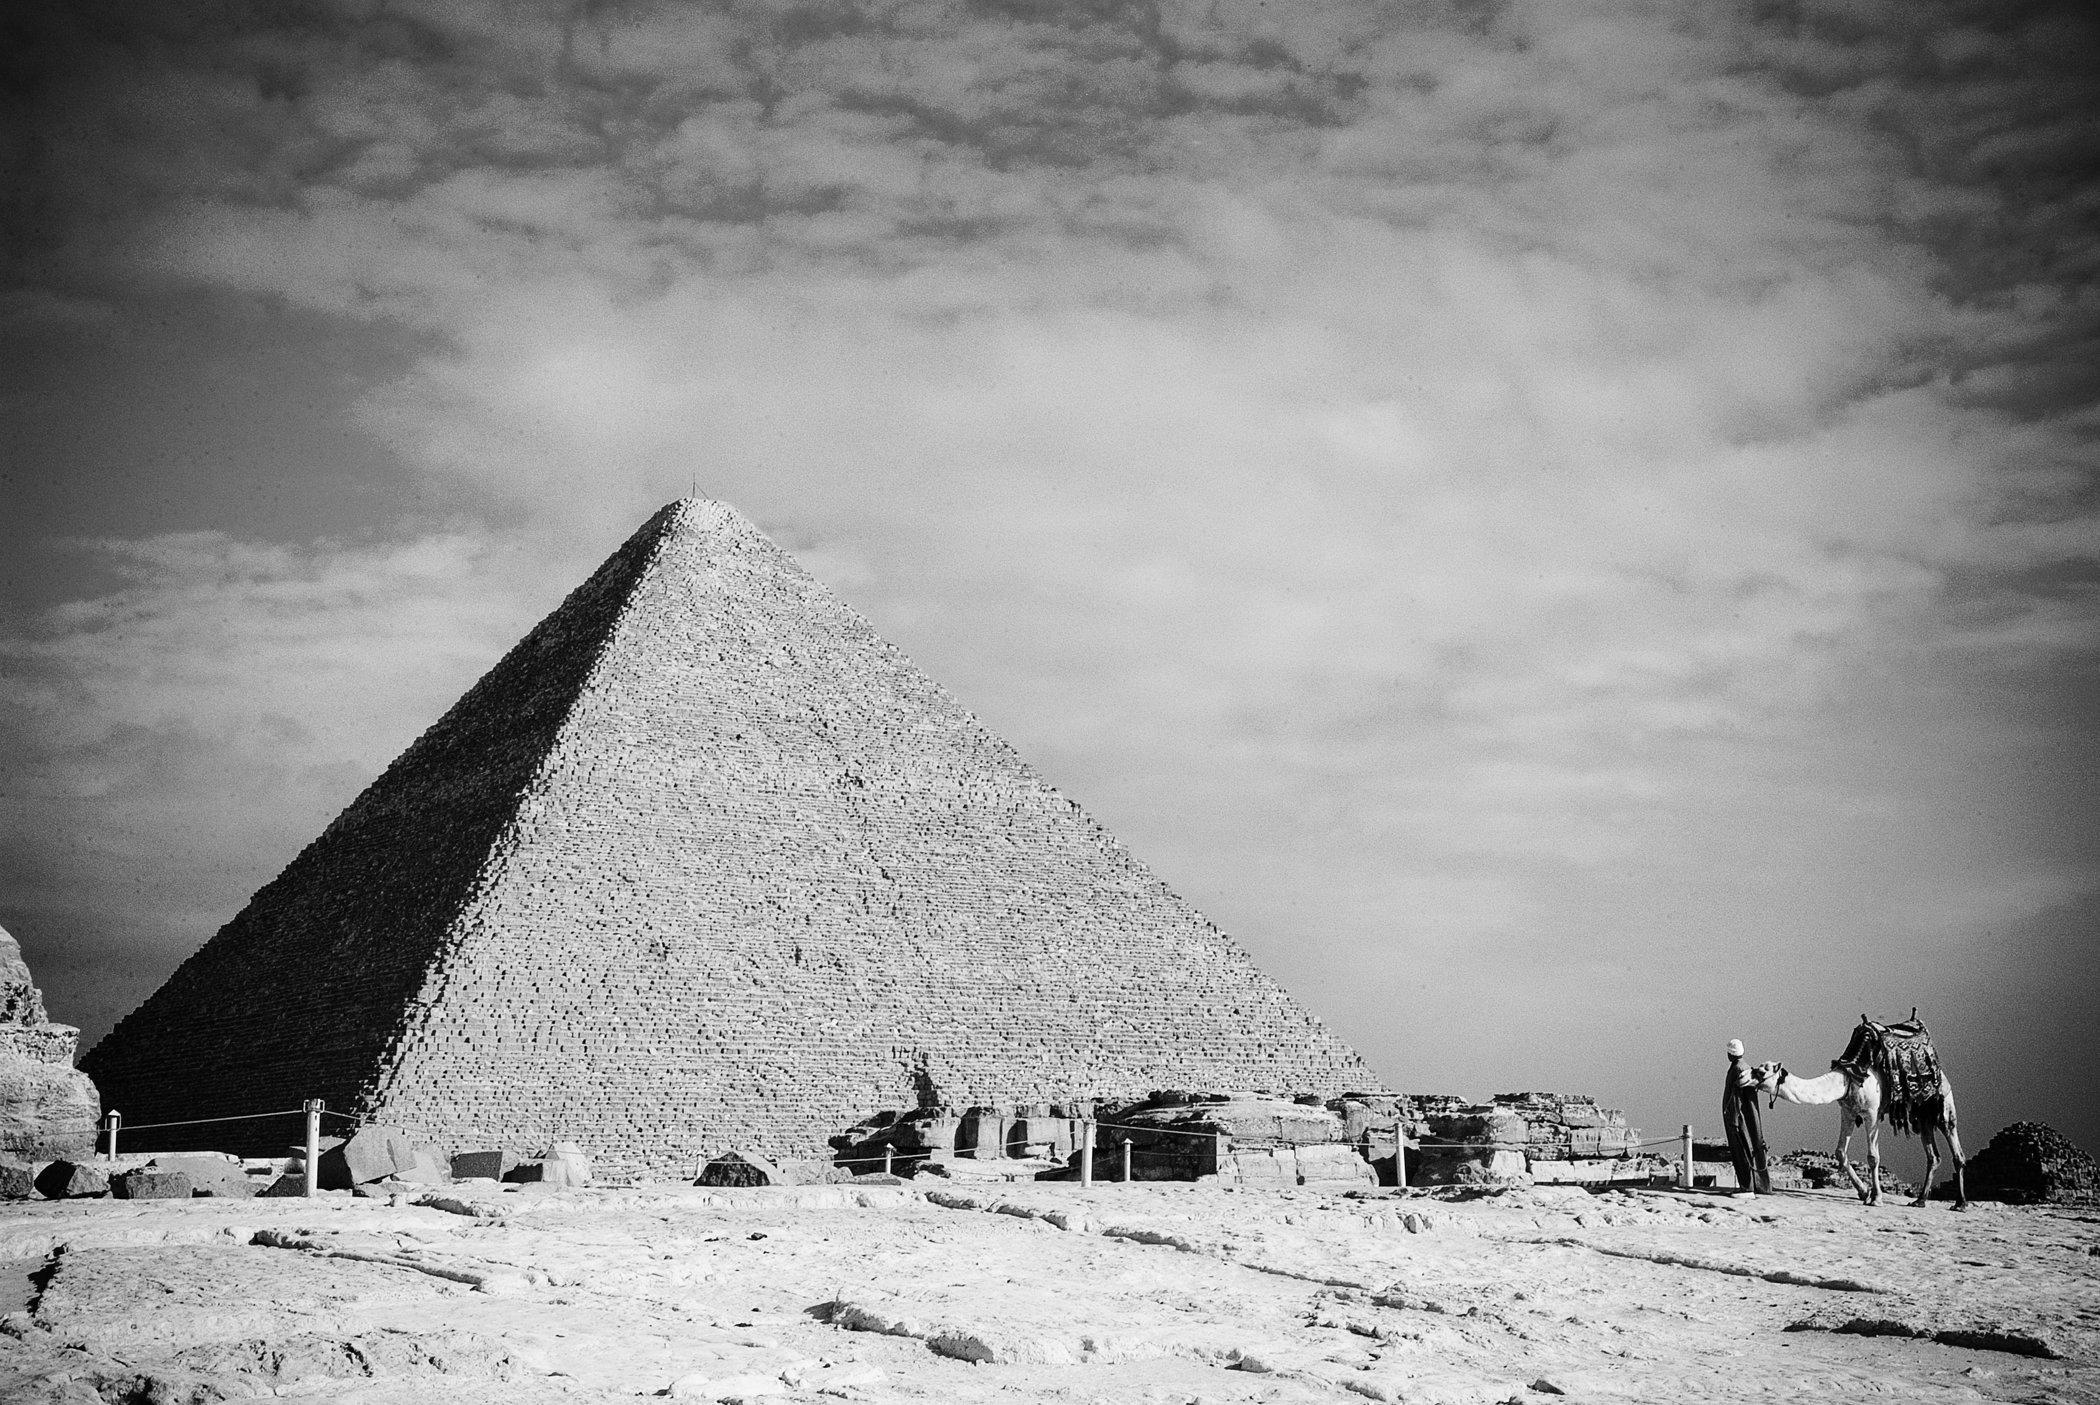 B&W Pyramid II